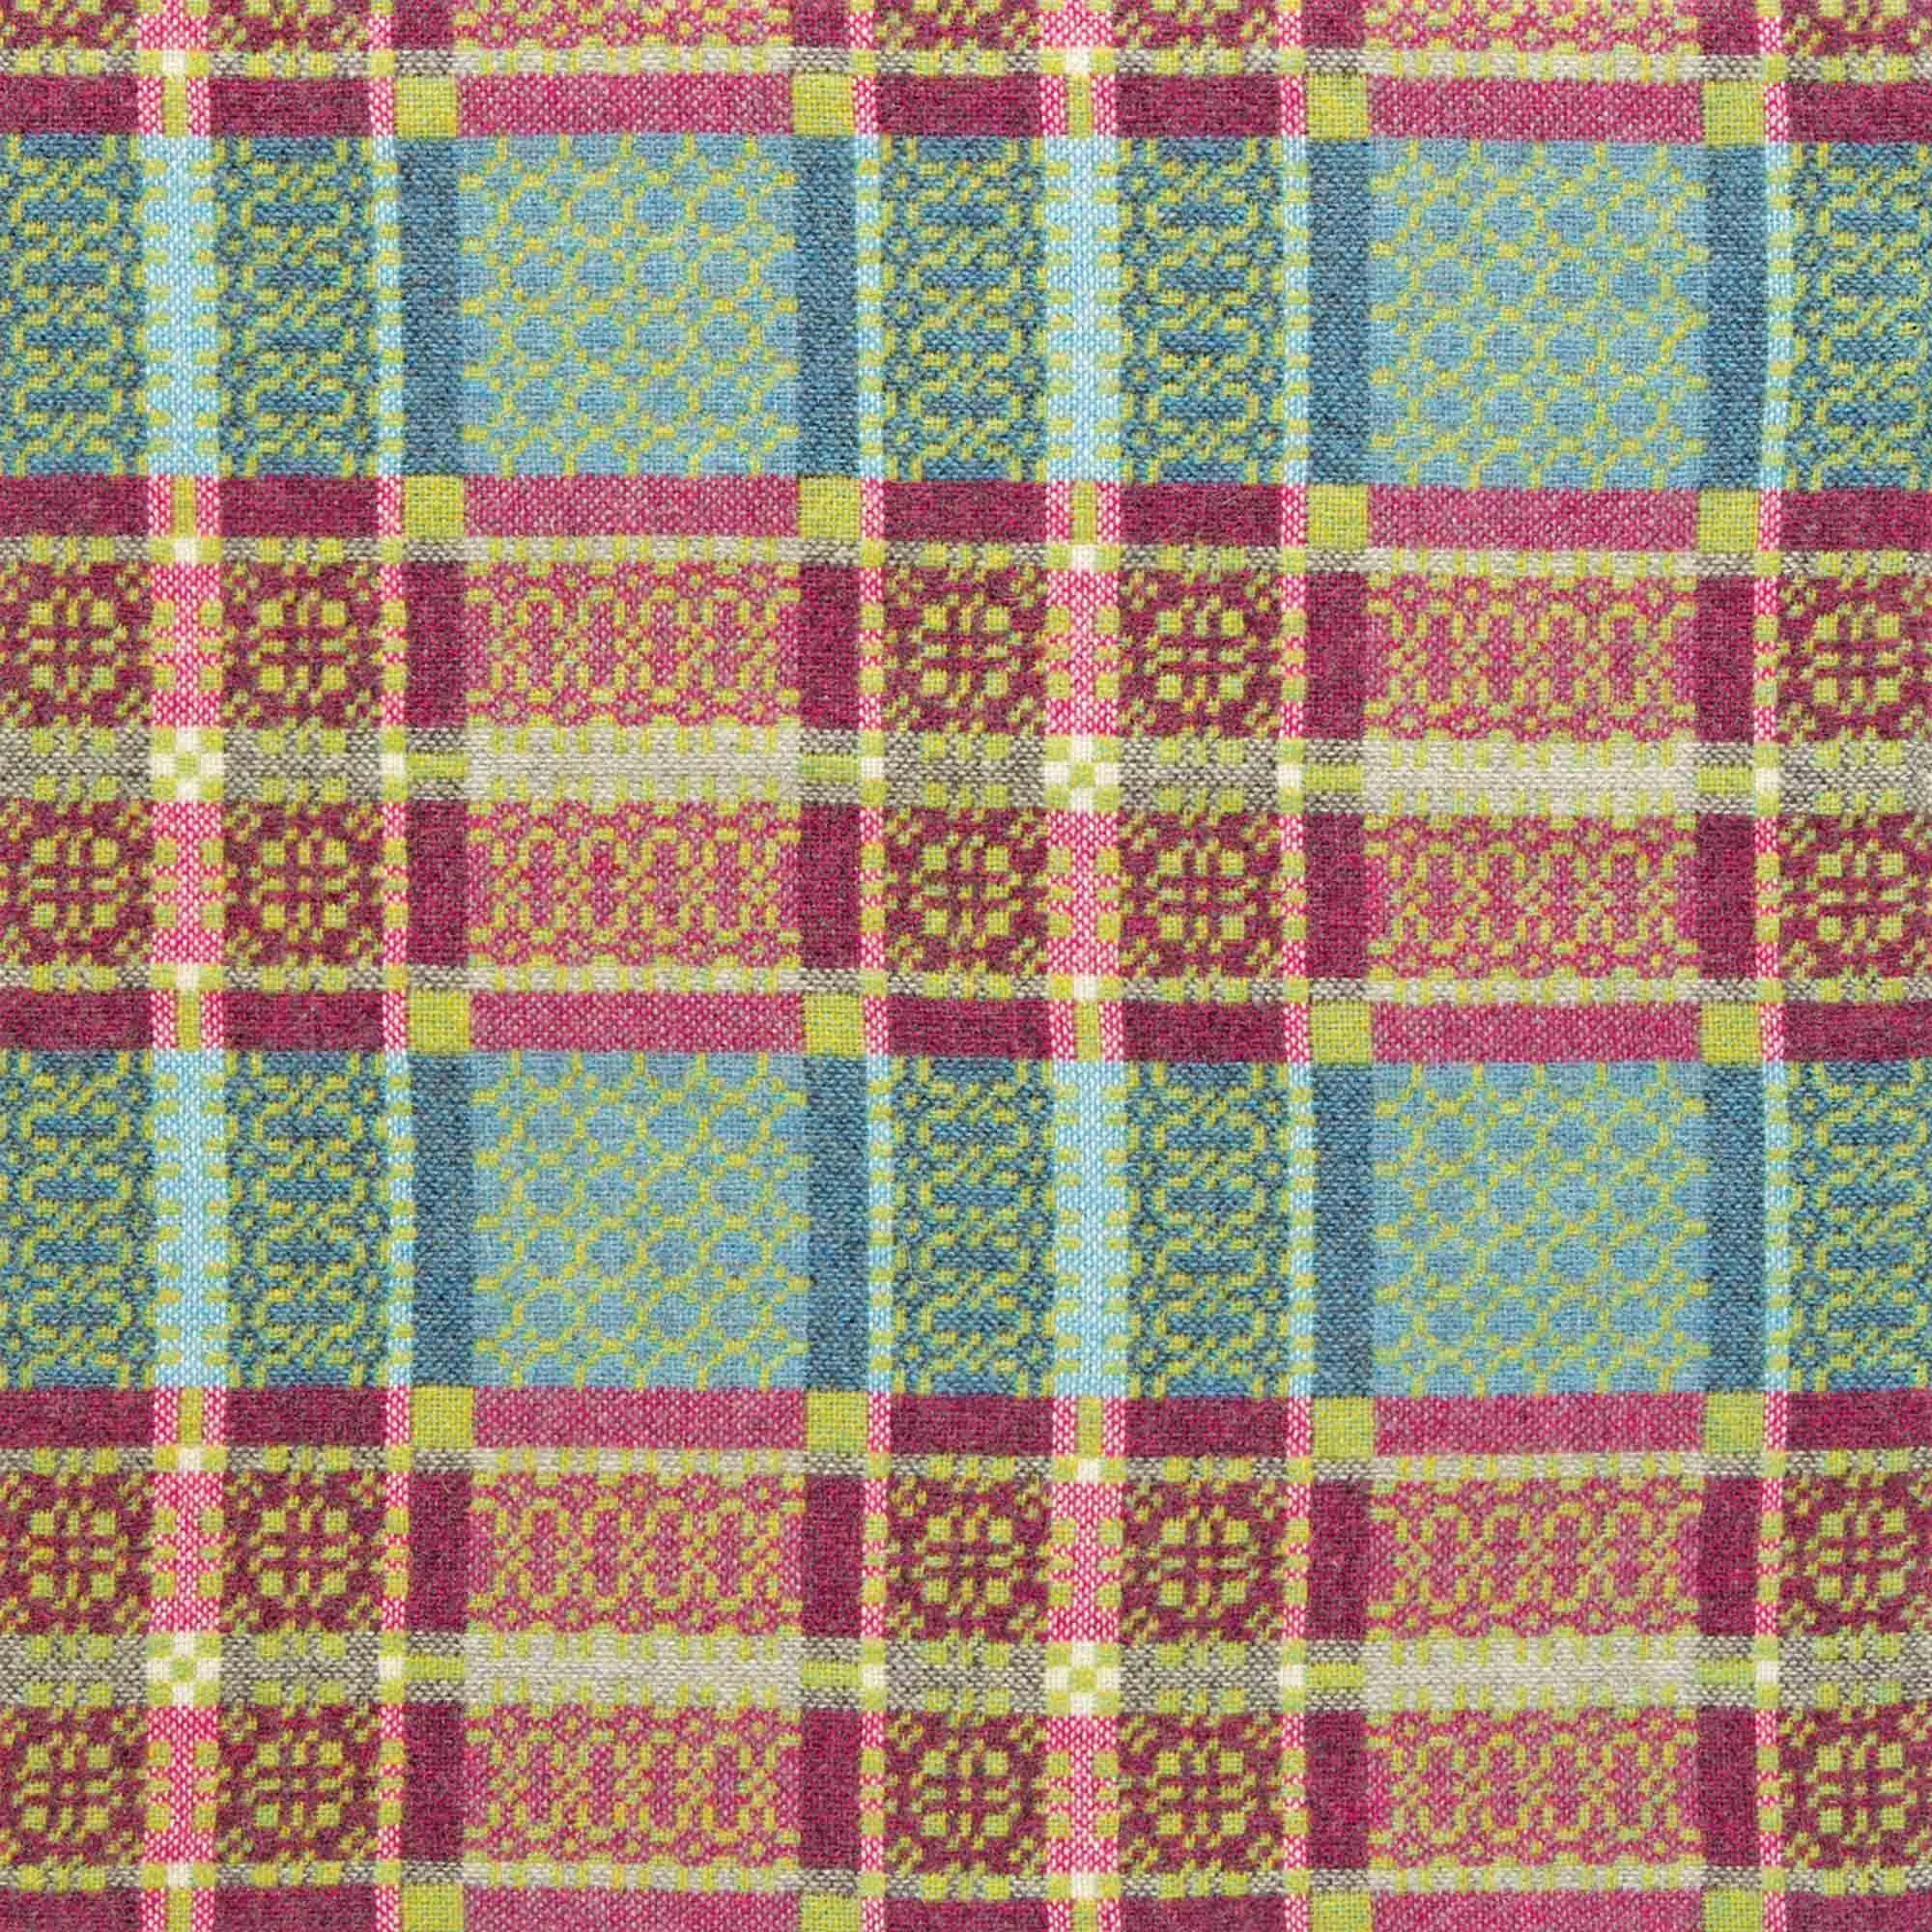 Knot-Garden Green Back_1733_2000.jpg